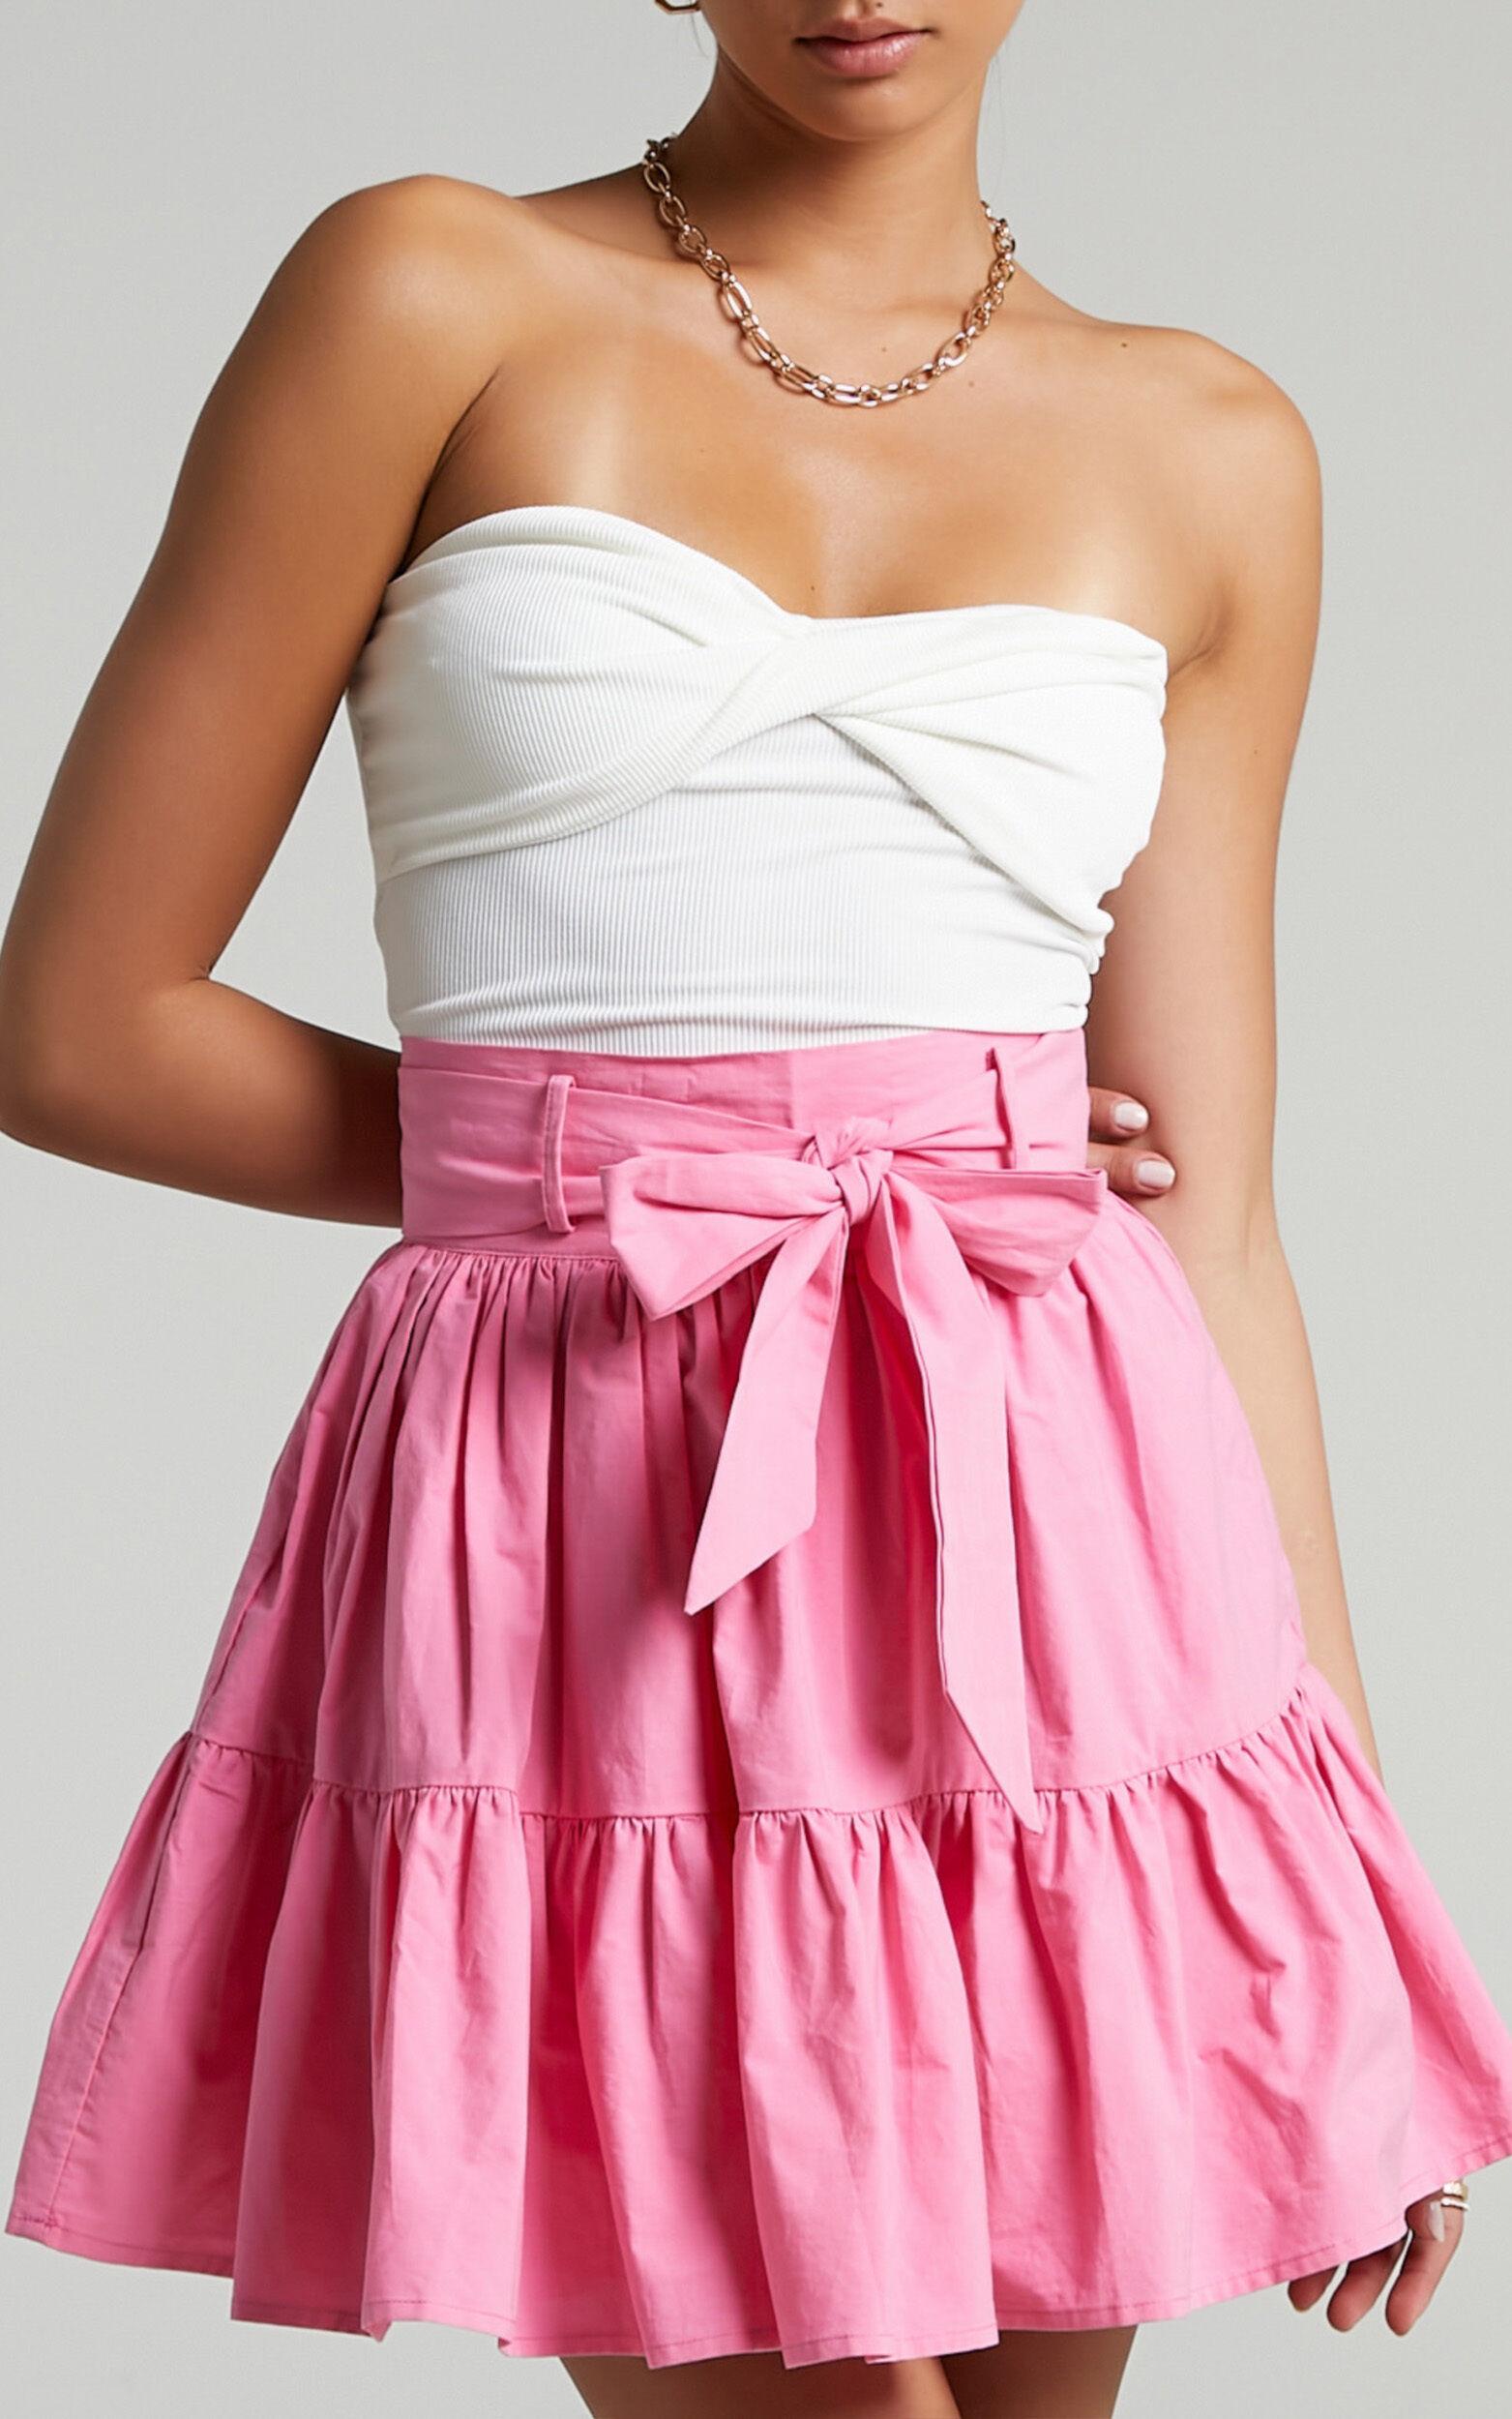 Meredith Mini skirt in Bubblegum Pink - 04, PNK2, super-hi-res image number null